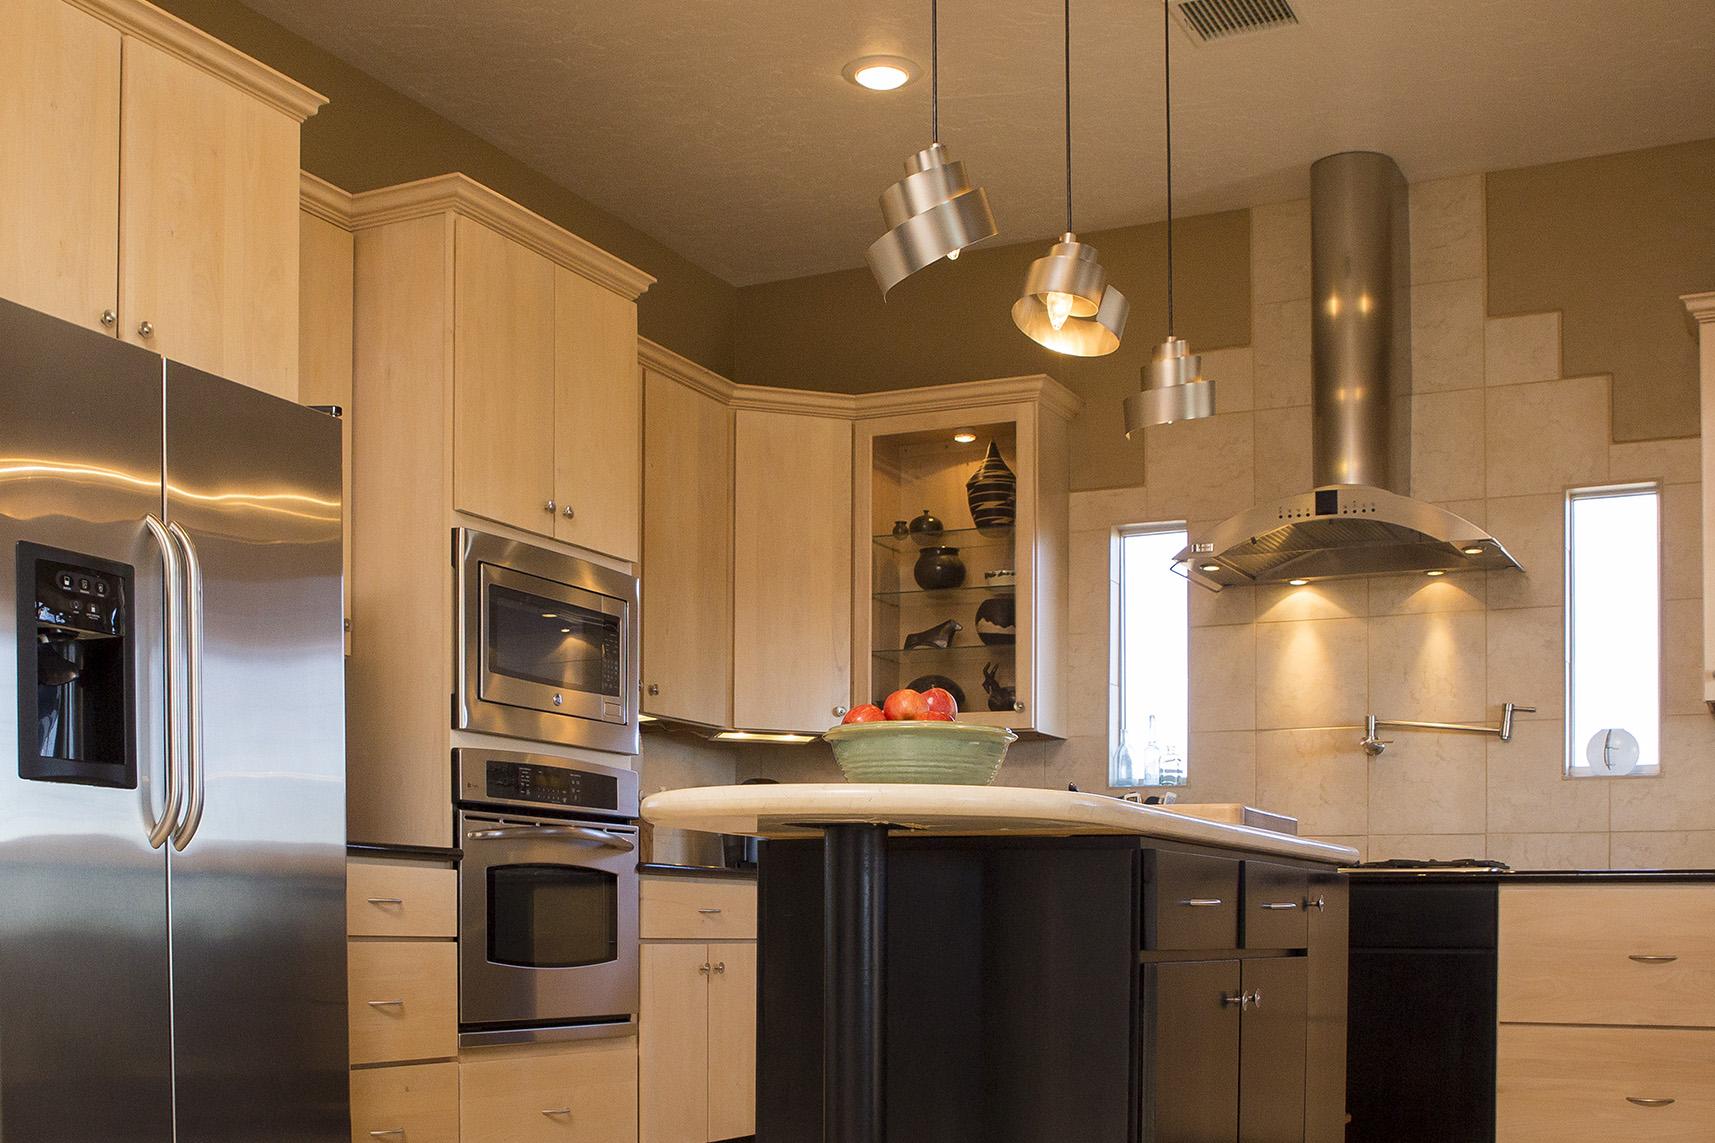 Kitchen, real estate